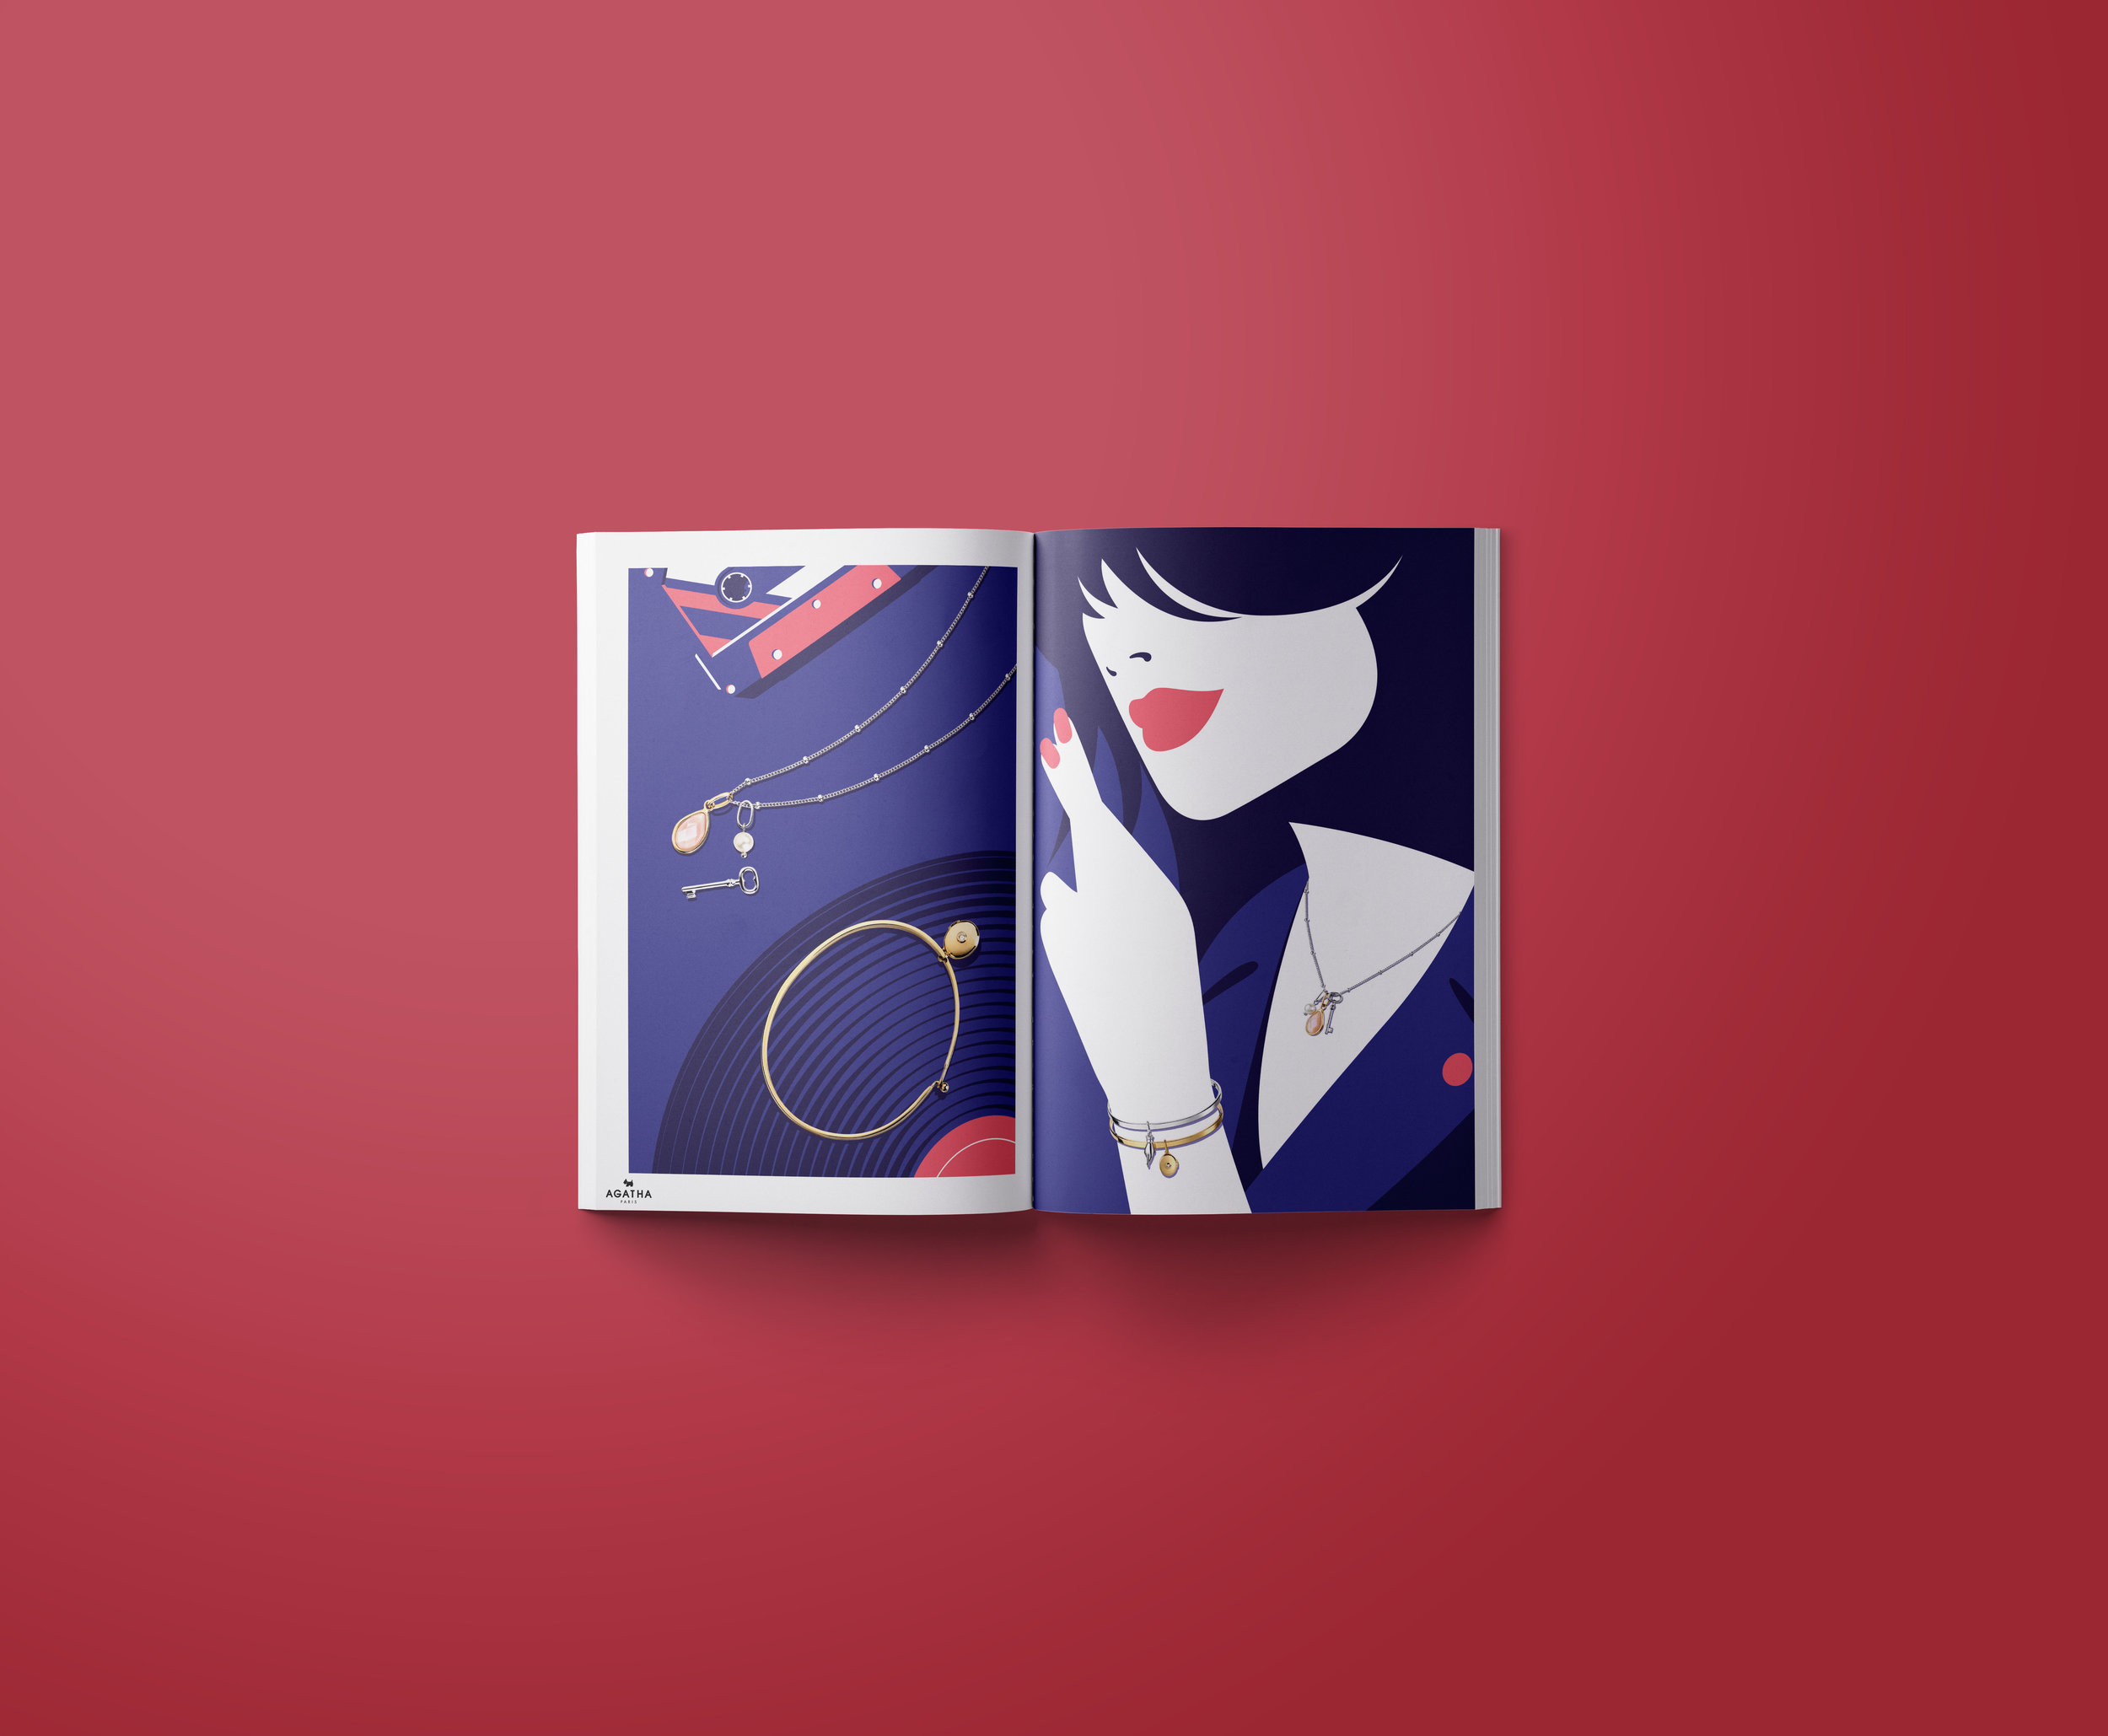 BATS-agatha-inter-catalogue-3.jpg